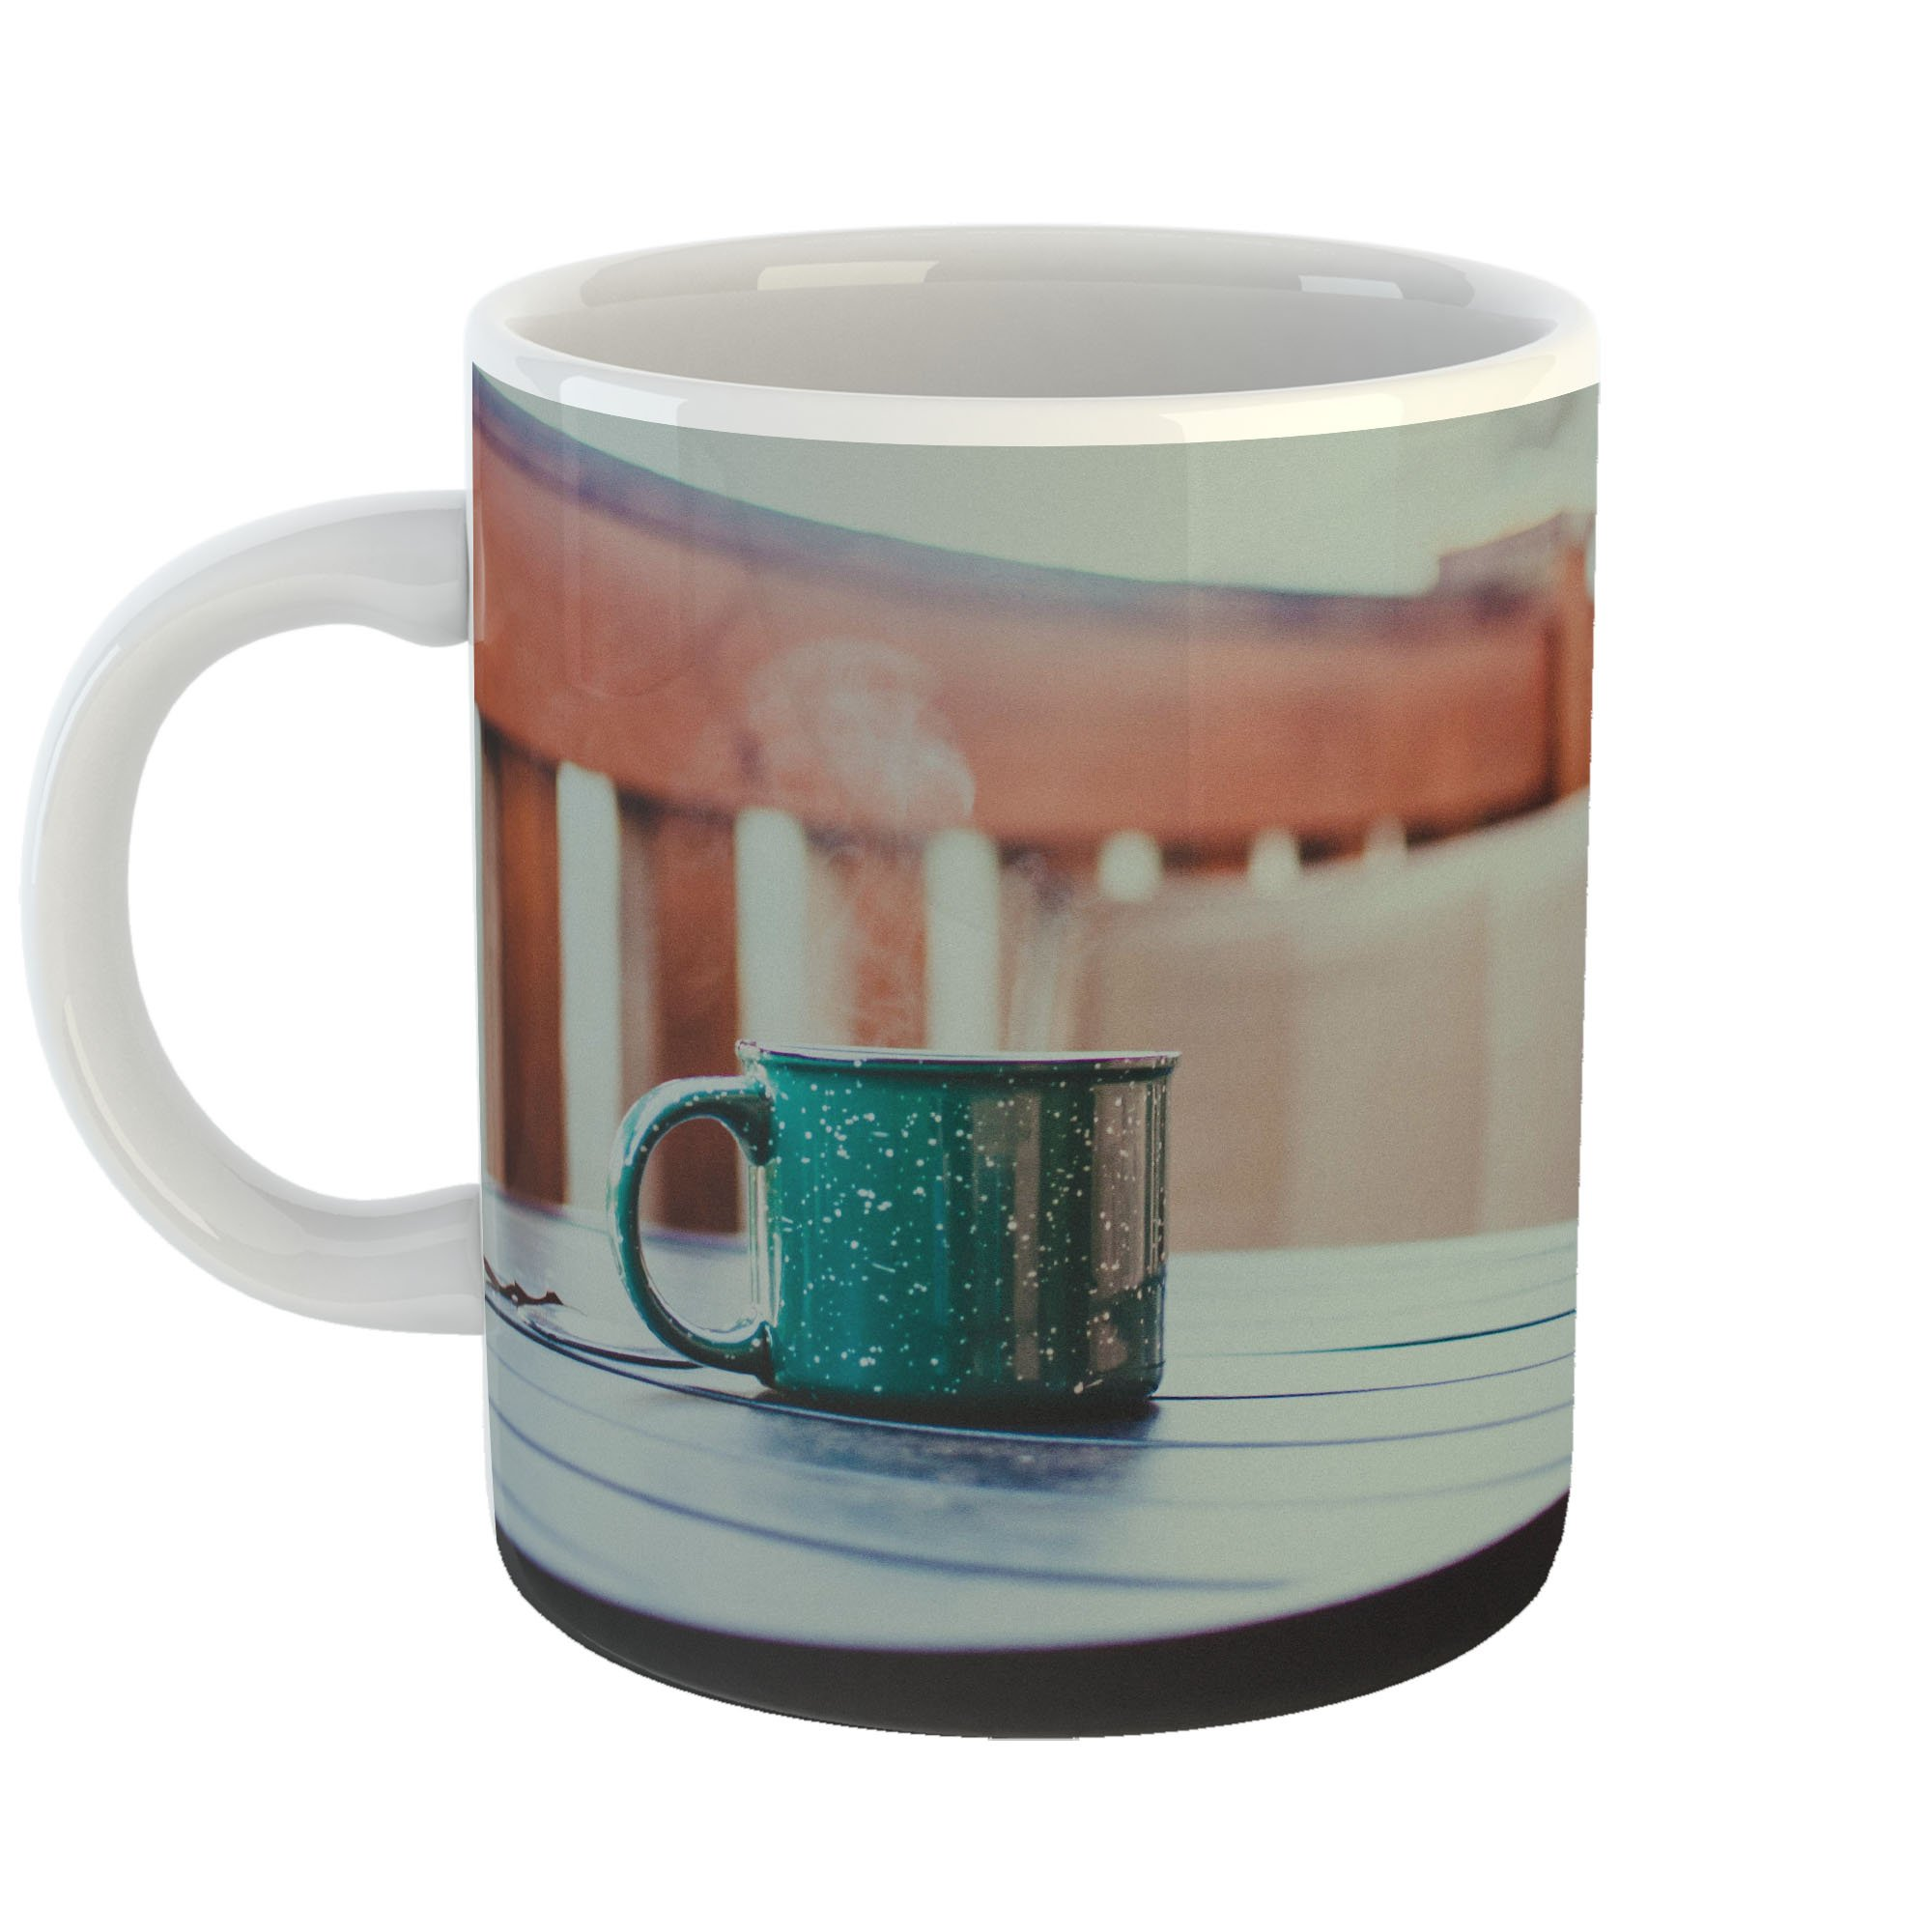 Westlake Art - Motel Hotel - 11oz Coffee Cup Mug - Modern Picture Photography Artwork Home Office Birthday Gift - 11 Ounce (2154-3DD3B)